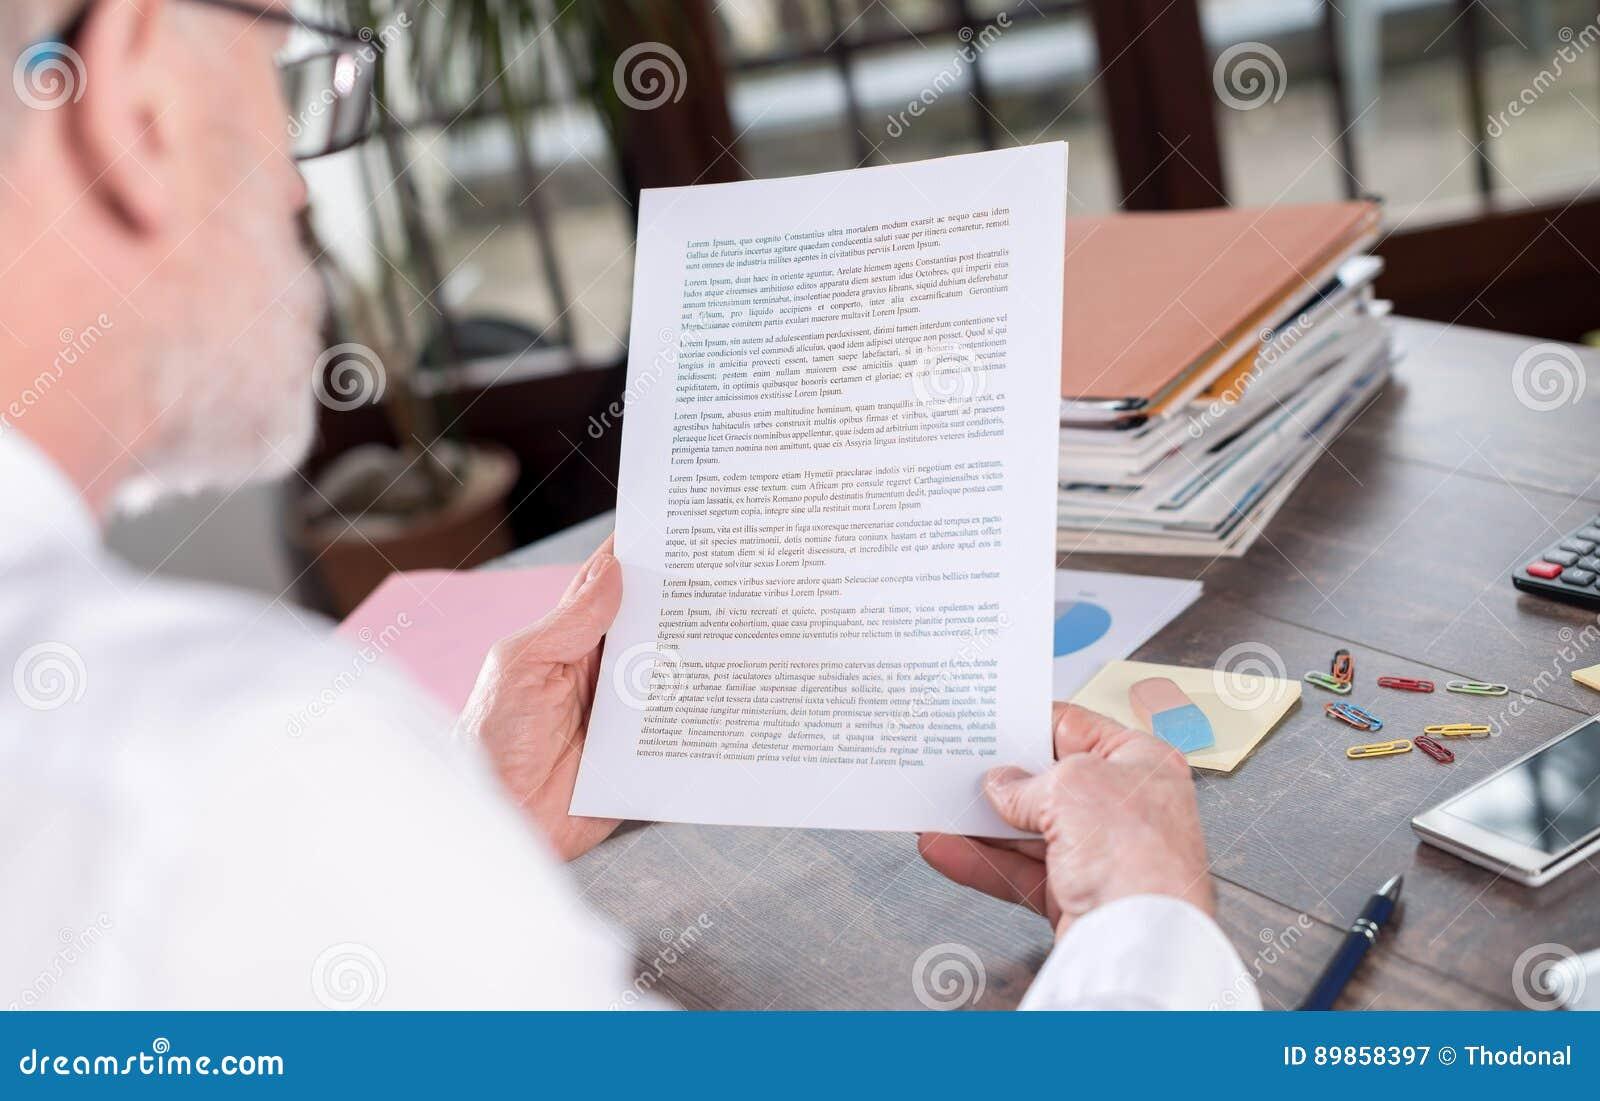 Biznesmen sprawdza dokument